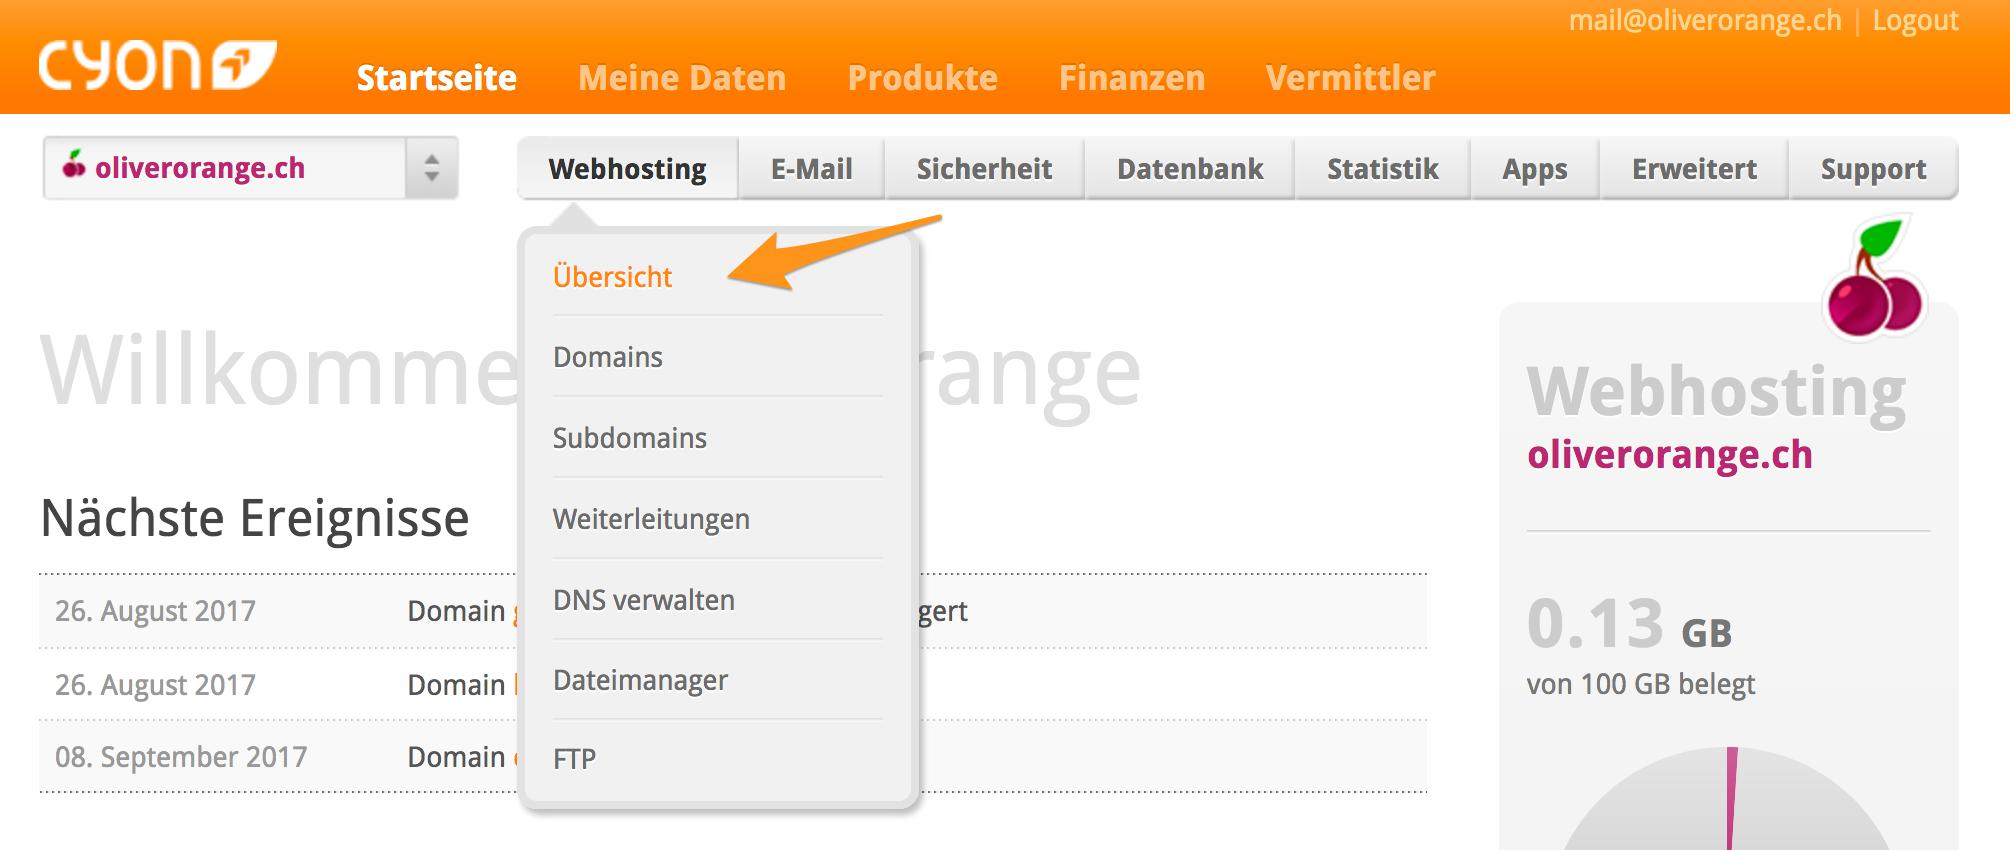 Menü «webhosting»> «Übersicht» im my.cyon